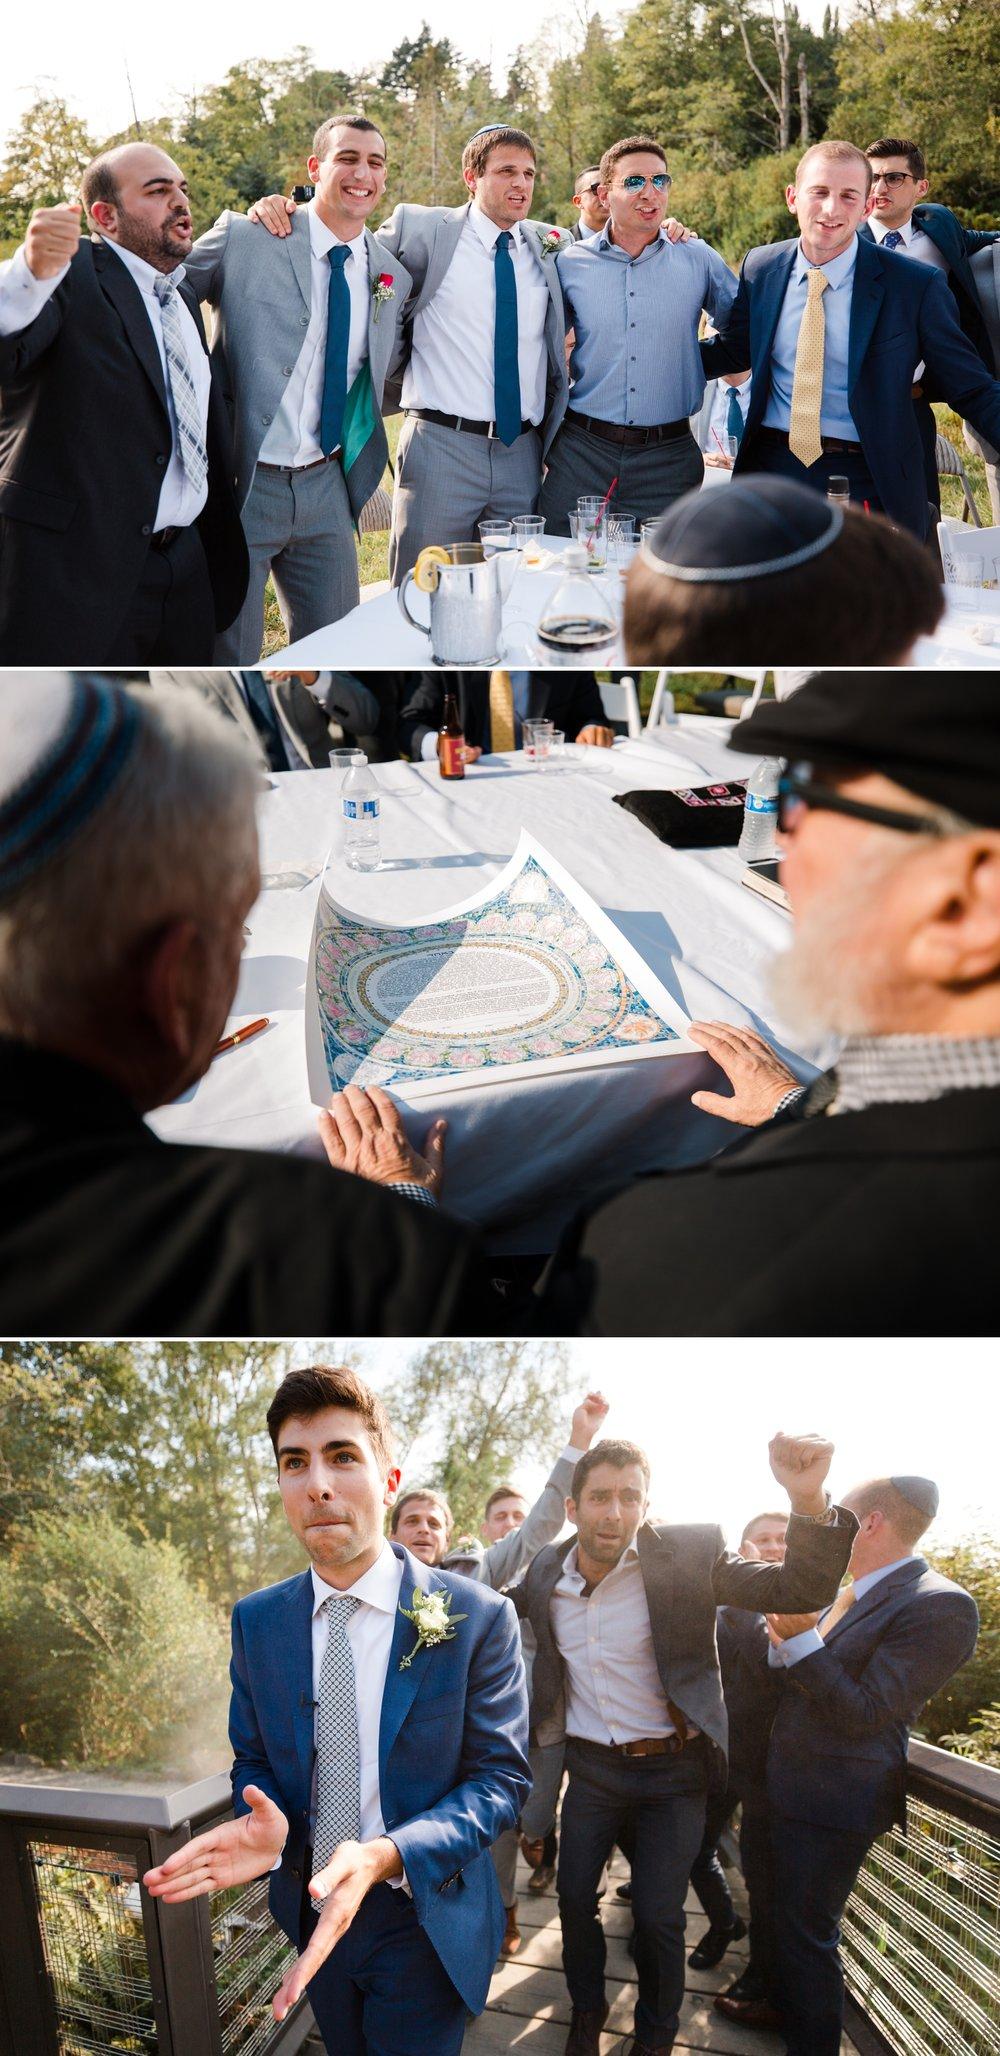 8-traditional-jewish-wedding-seattle-washington.jpg